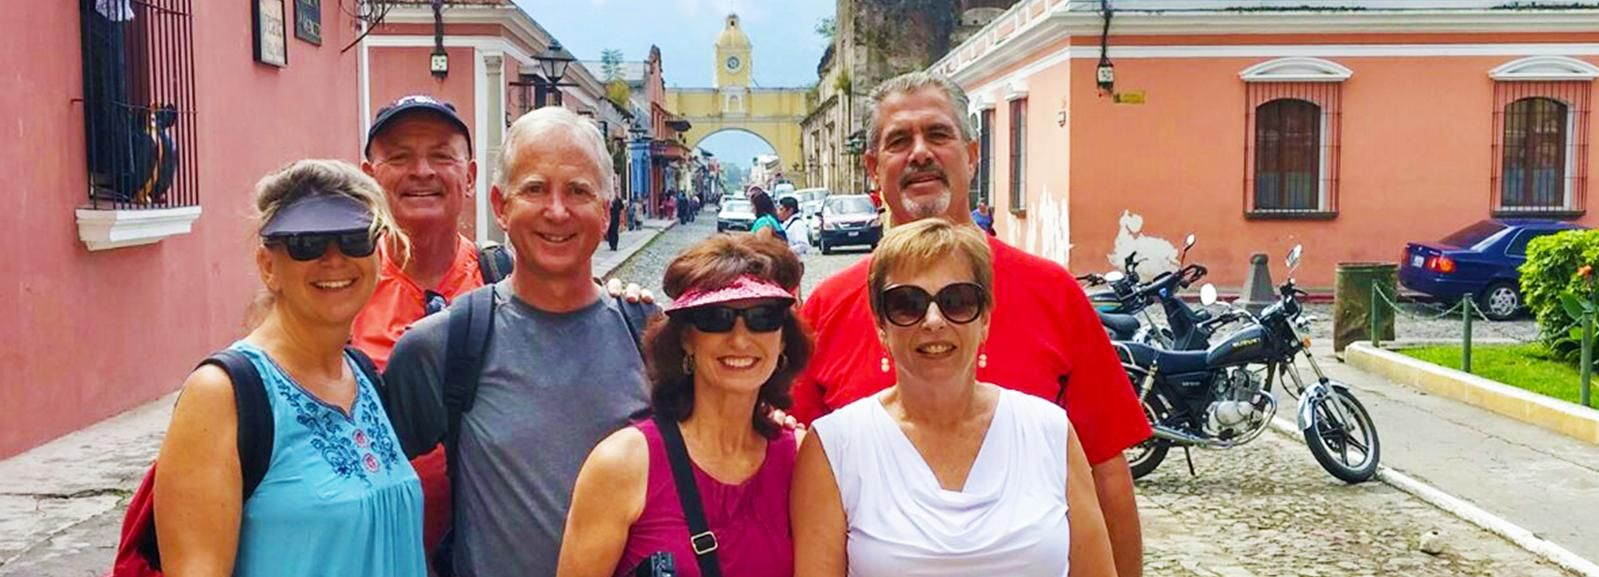 Antigua Guatemala Full–Day Walking Tour from Puerto Quetzal